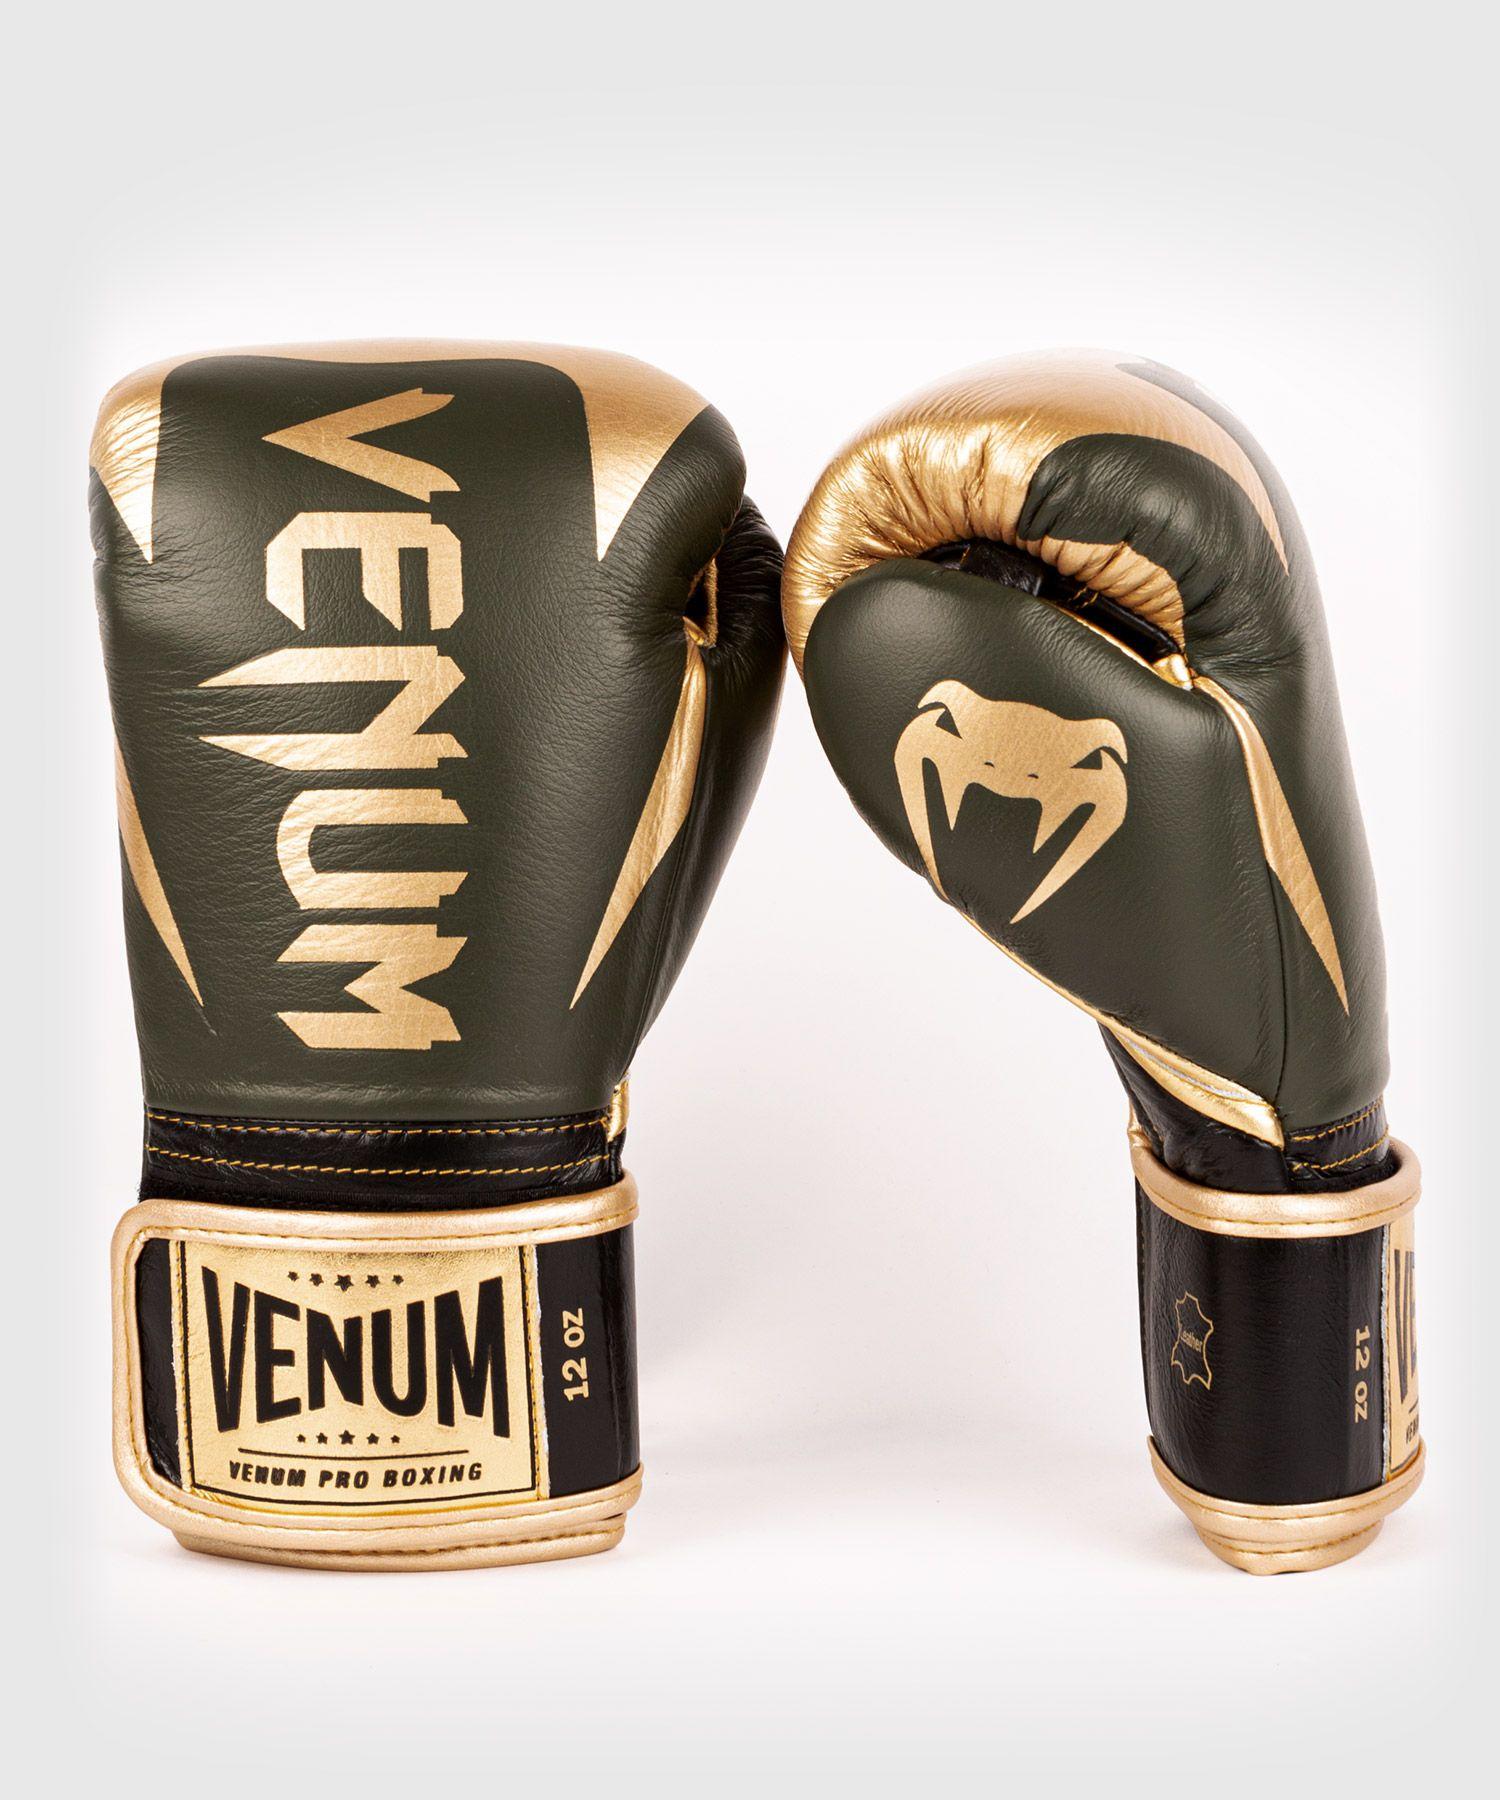 Gants de boxe pro Venum Hammer - Velcro - Kaki/Or